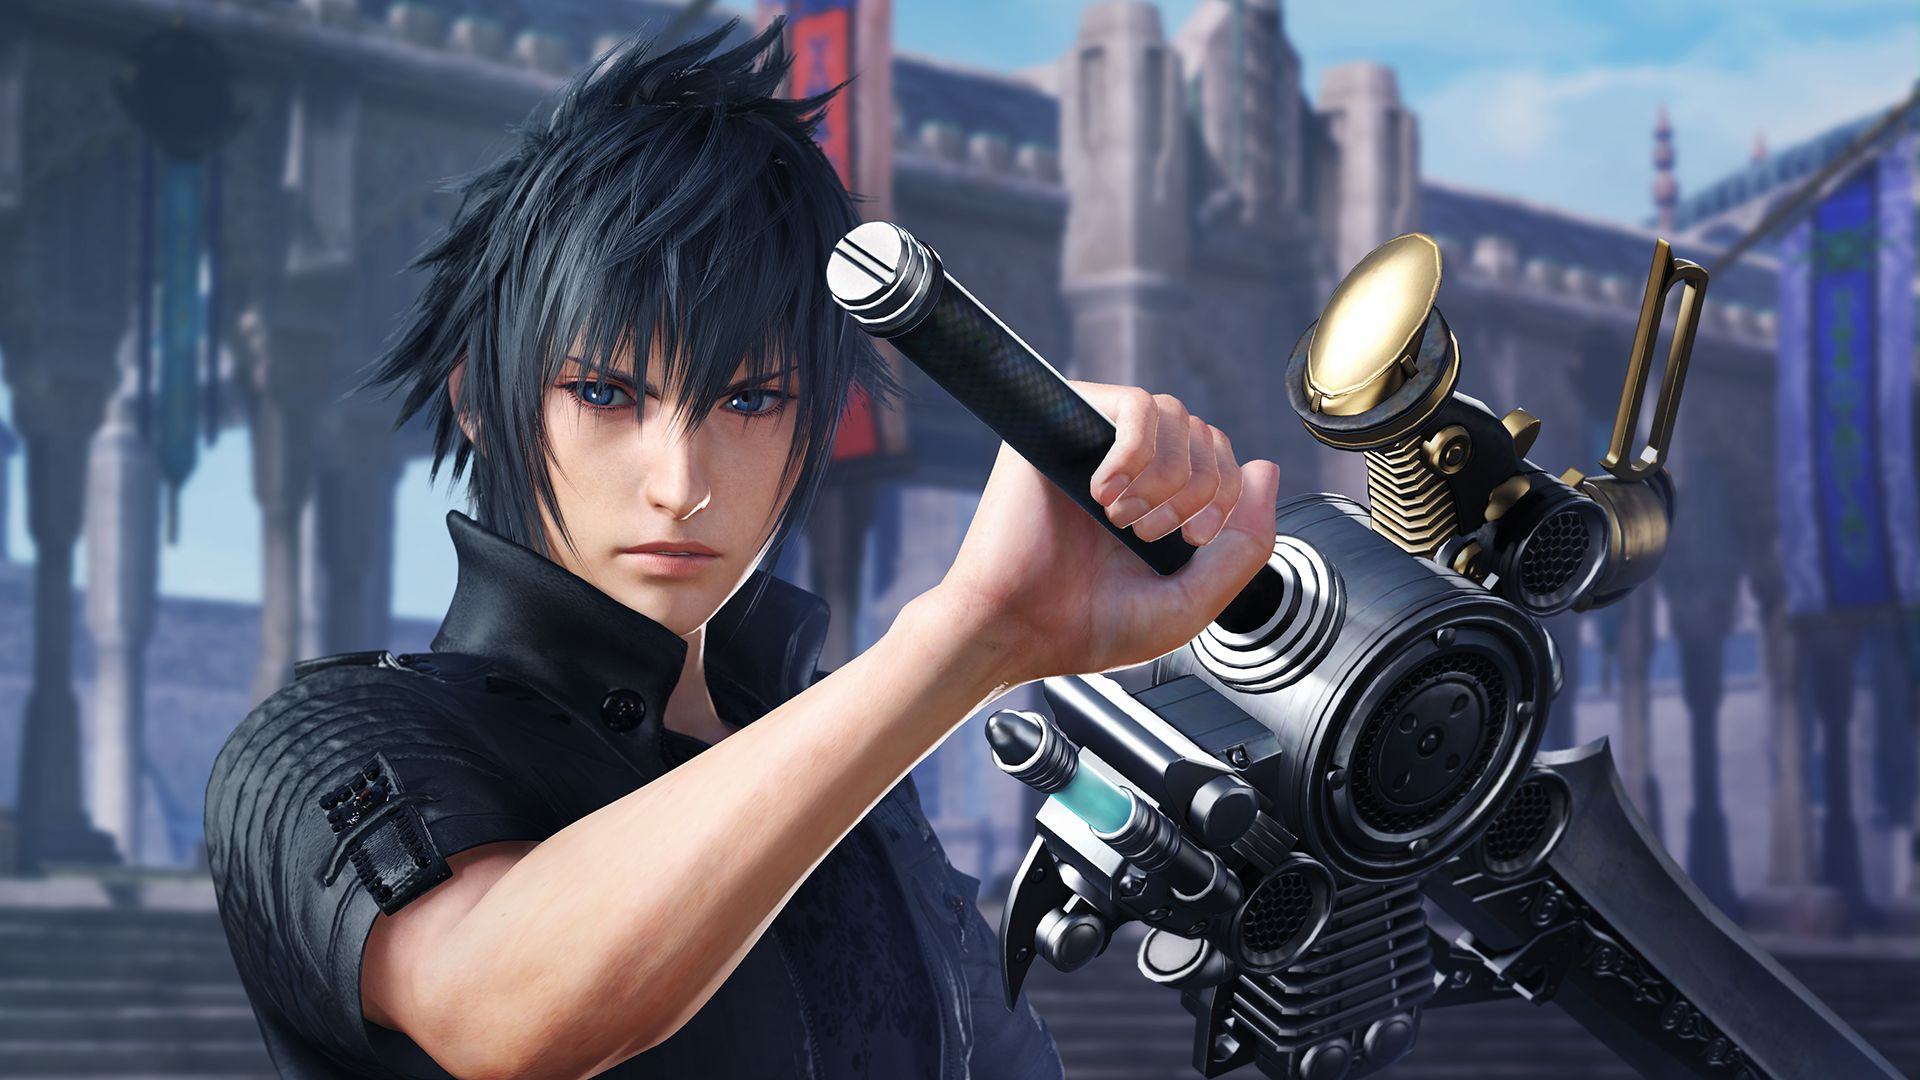 Dissidia Final Fantasy NT just got a free version in Japan, go grab it screenshot